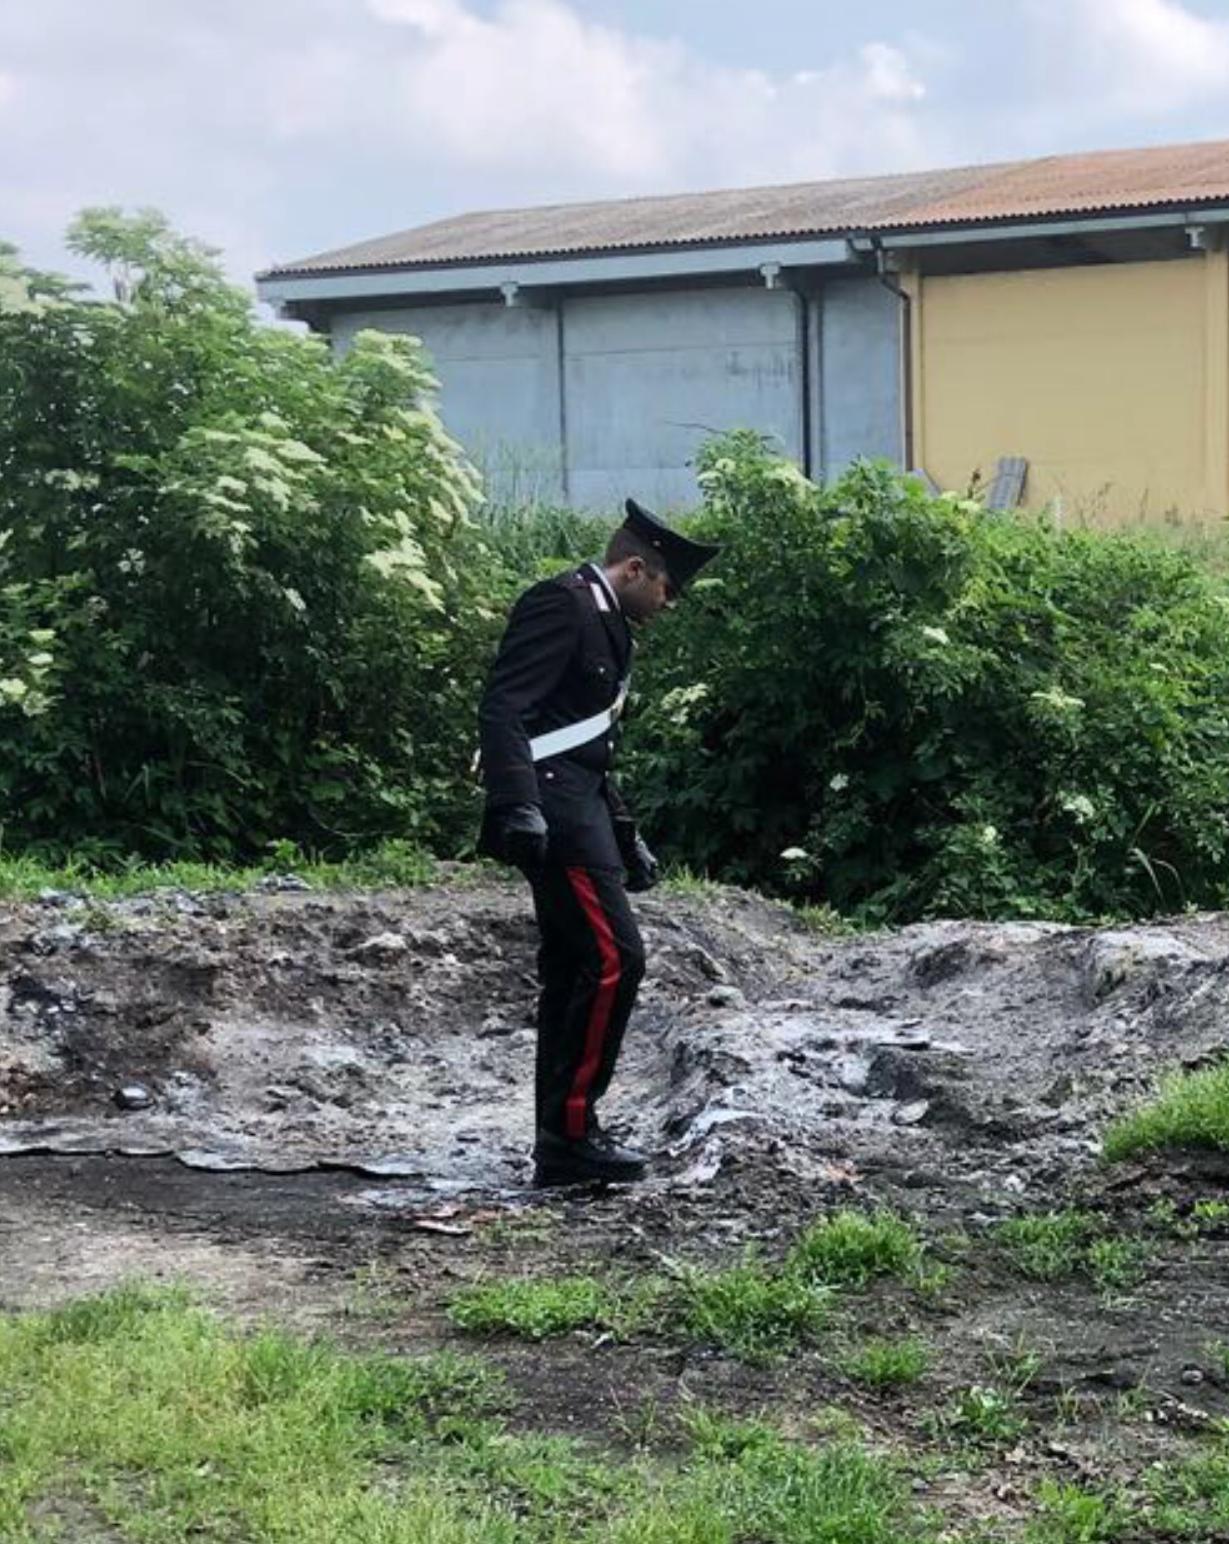 Plastica bruciata nei campi a Sartirana: denunciato 30enne